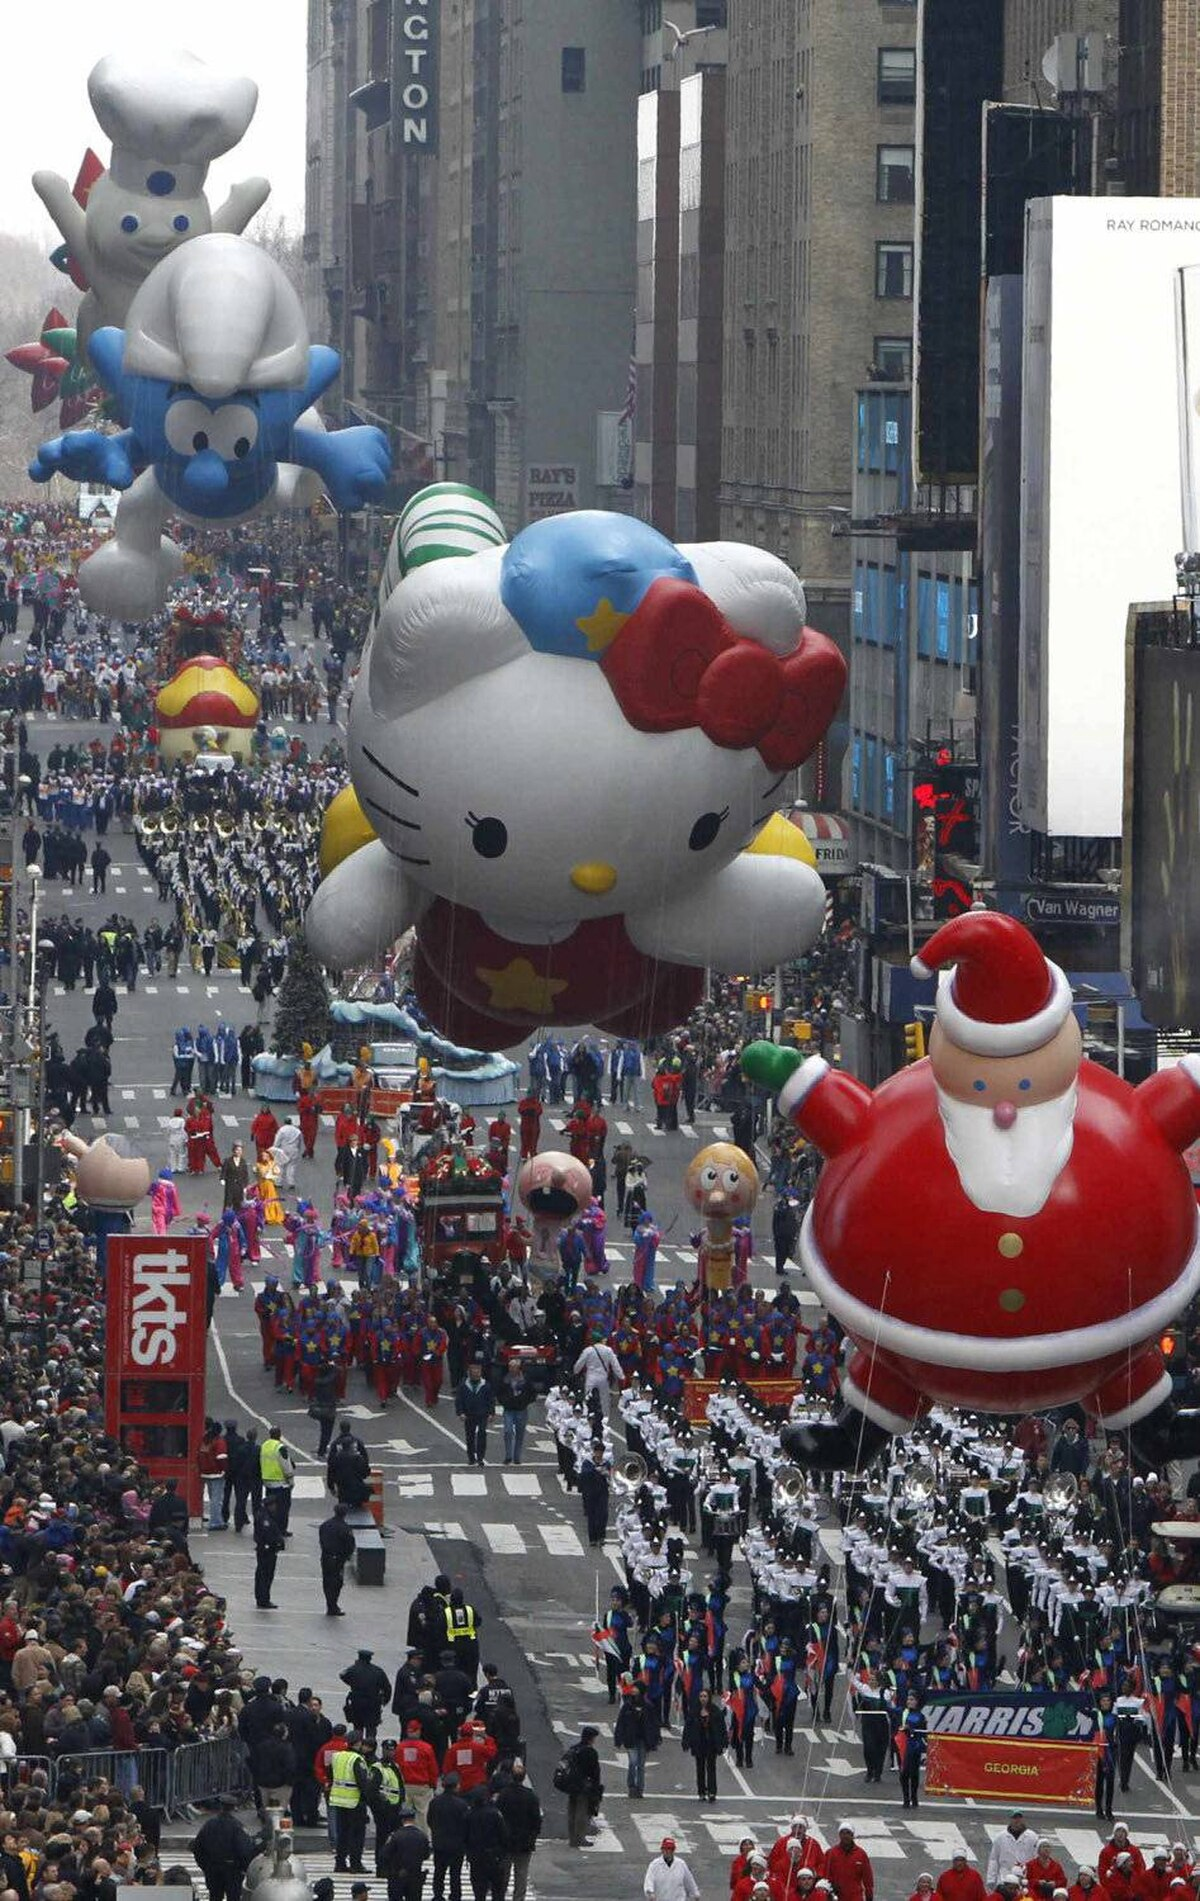 So Santa, Hello Kitty and a Smurf walk into a bar ... Year: 2009